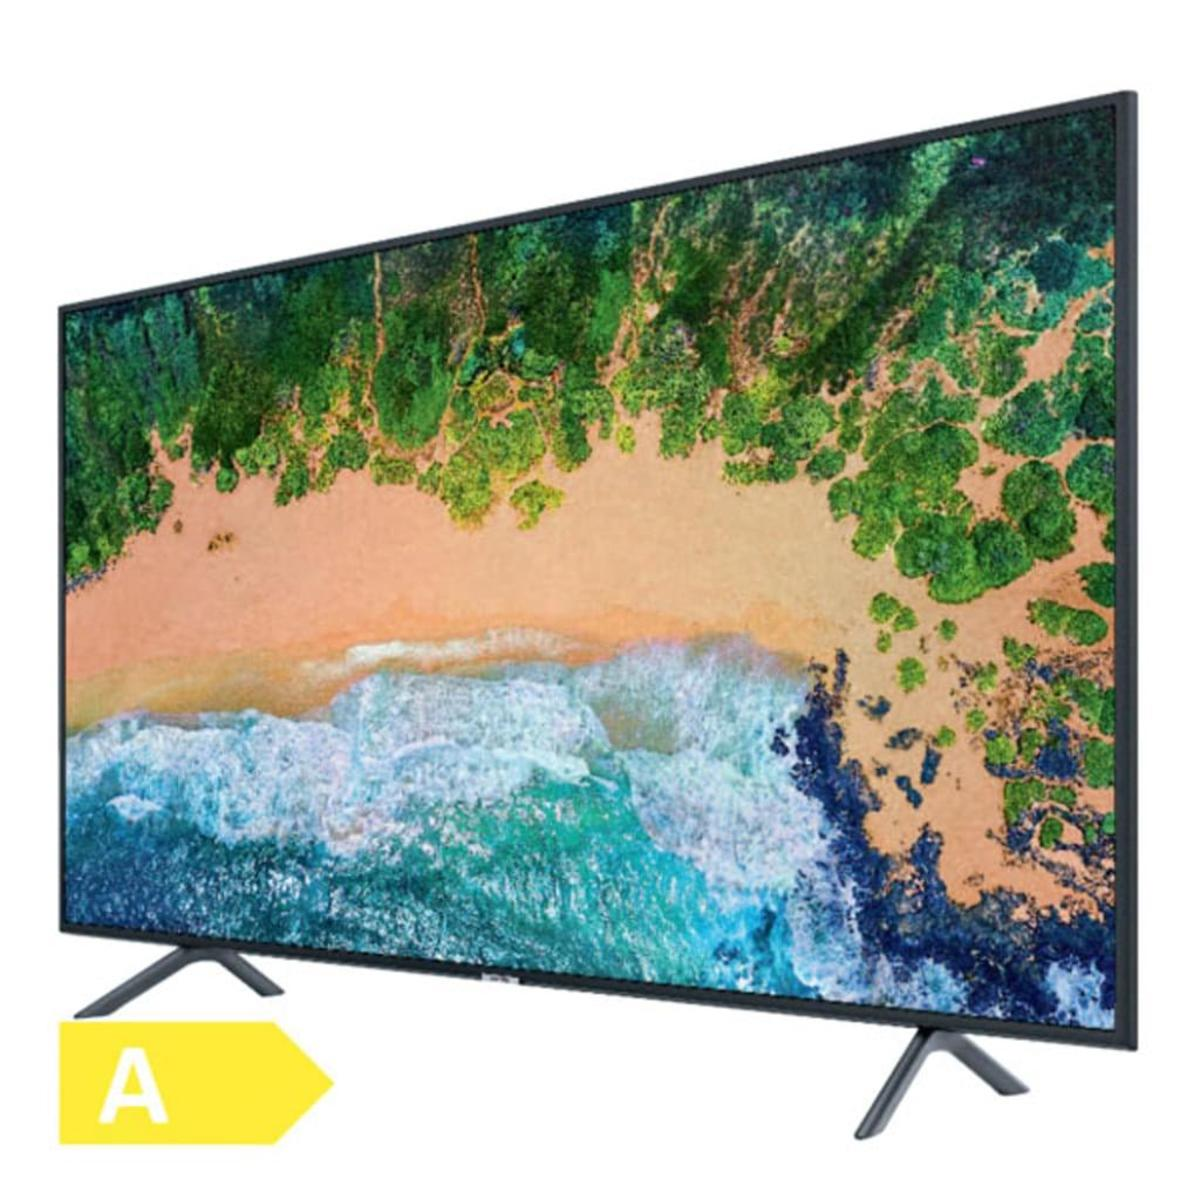 Bild 4 von Samsung UE43NU7199 UXZG LED-TV 43